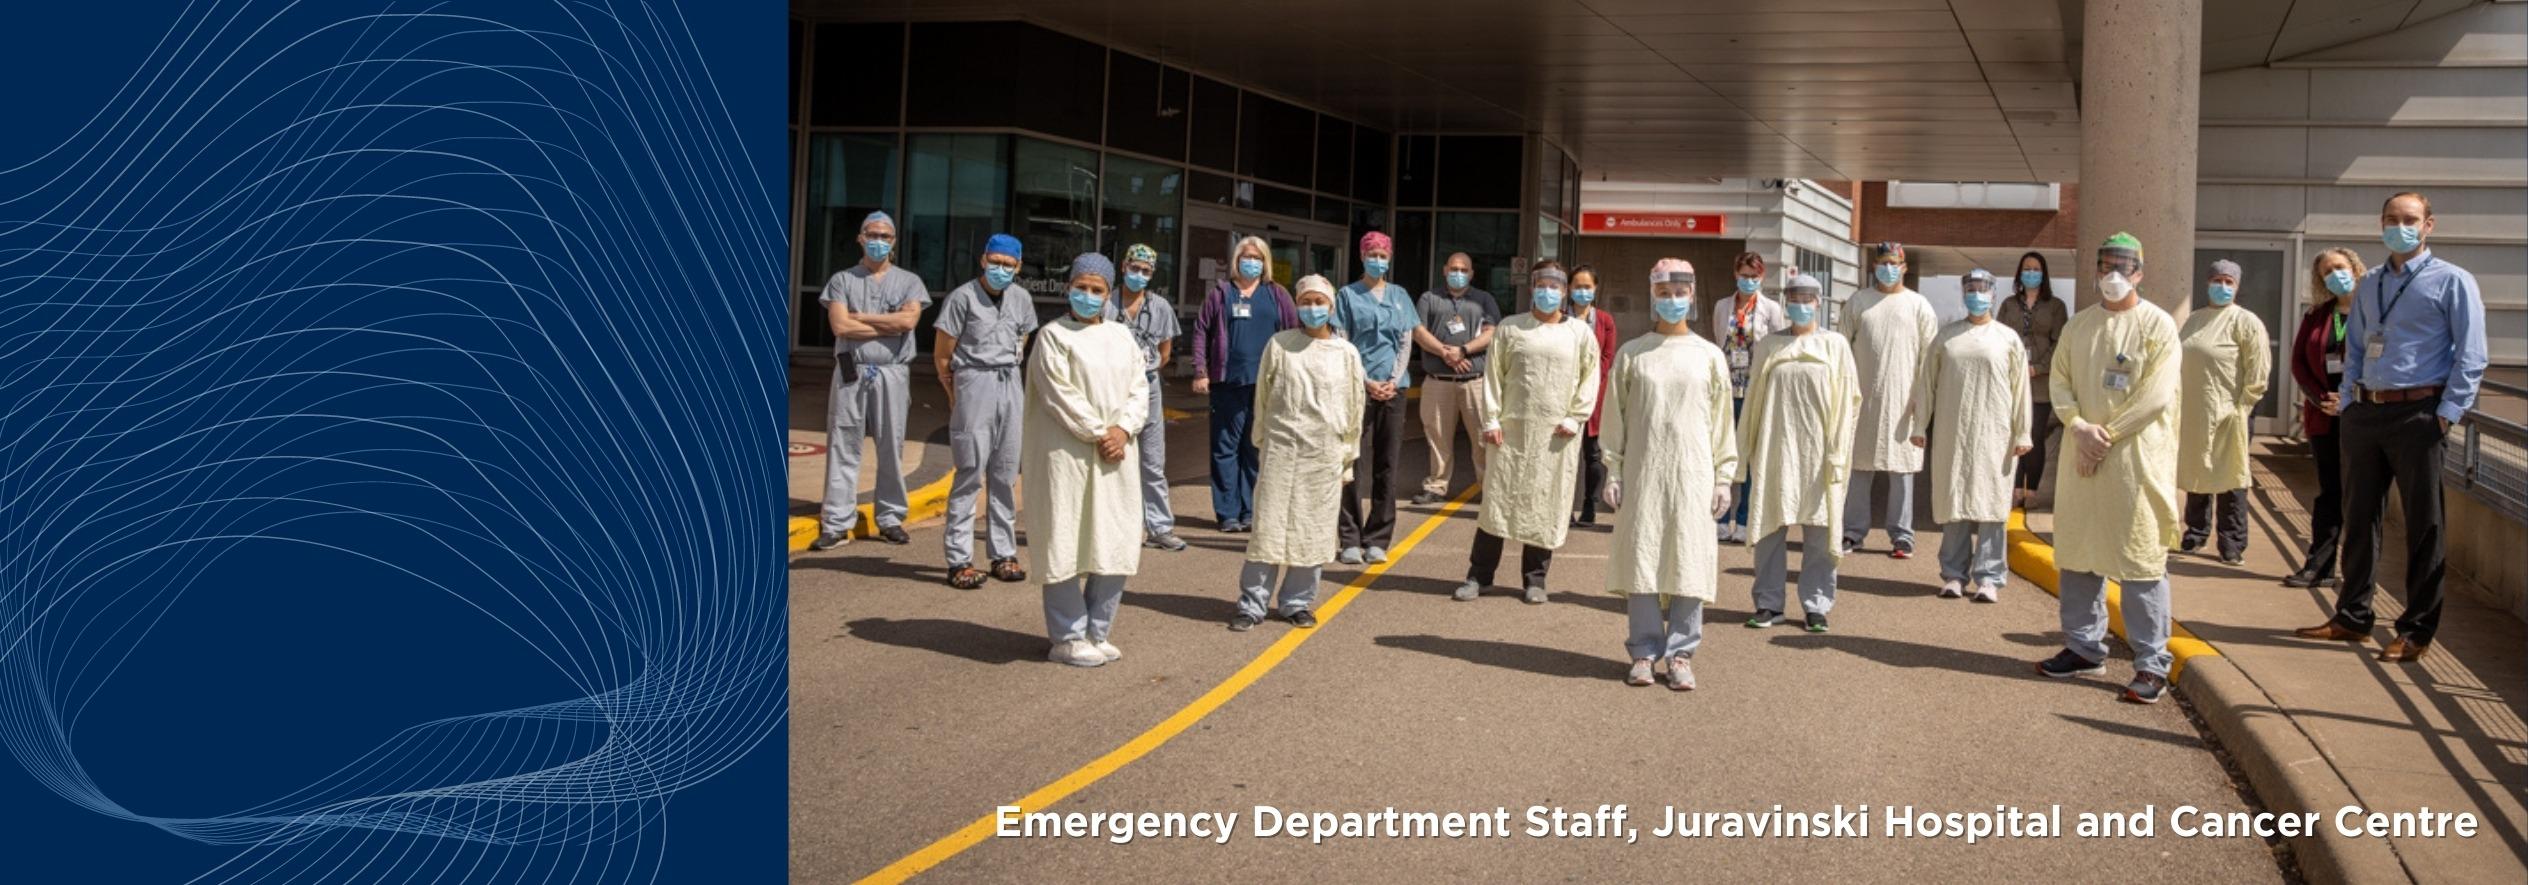 Emergency Department Staff, Juravinski Hospital and Cancer Centre